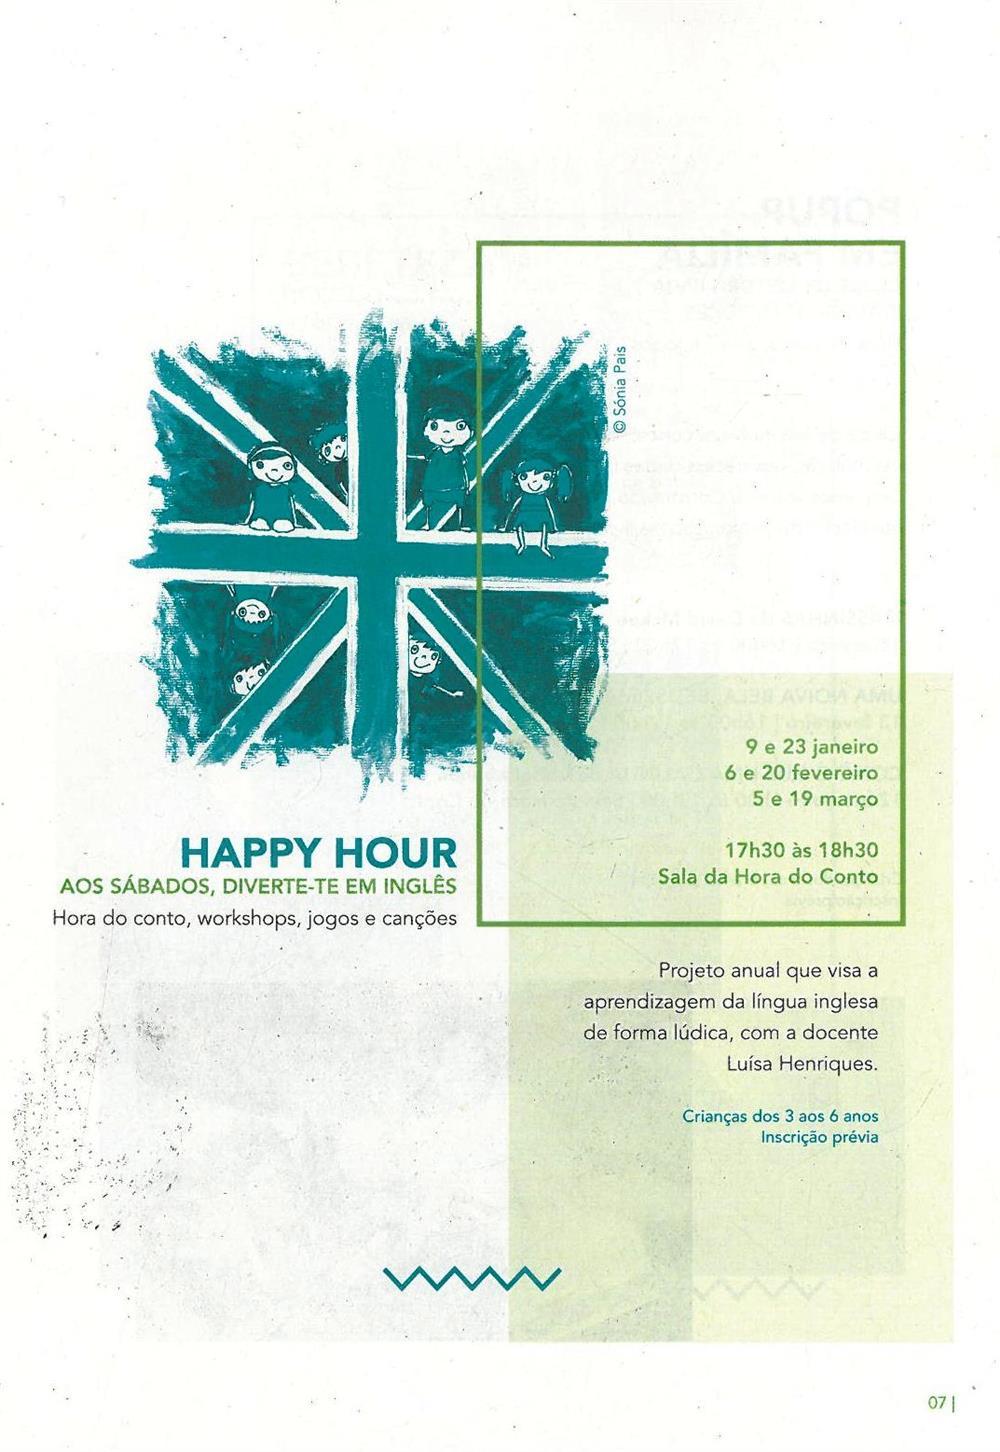 ACMSV-jan.,fev.,mar.'16-p.7- Happy Hour.jpg